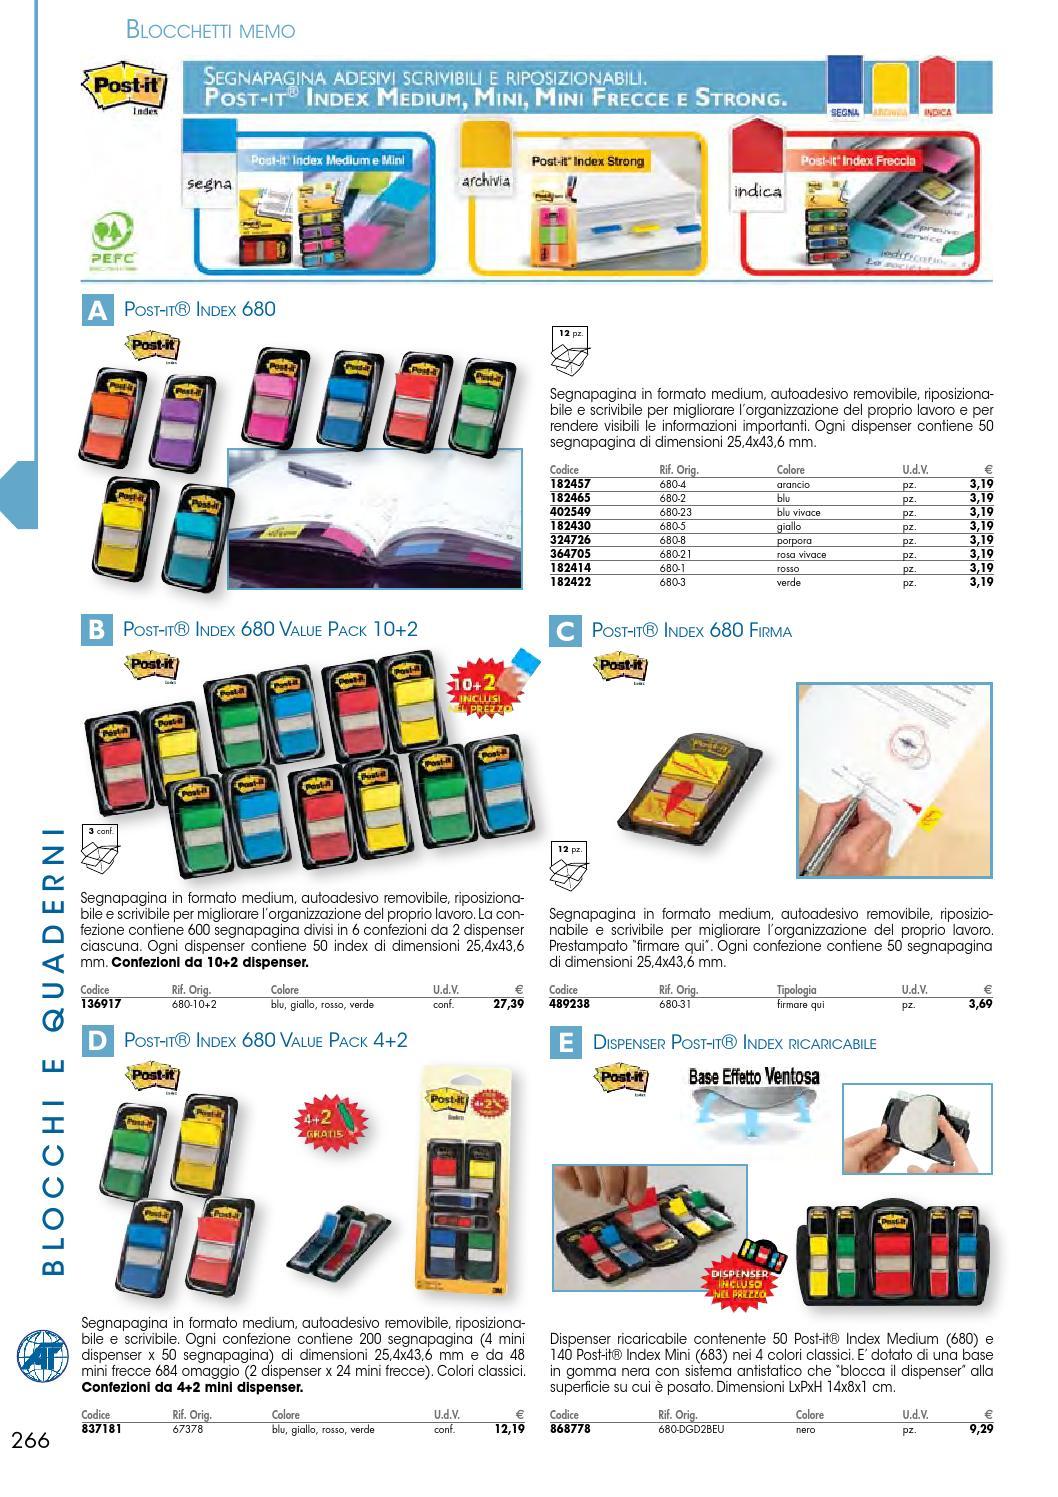 Post-It 680-DGD2BEU Dispenser Index Ricaricabile